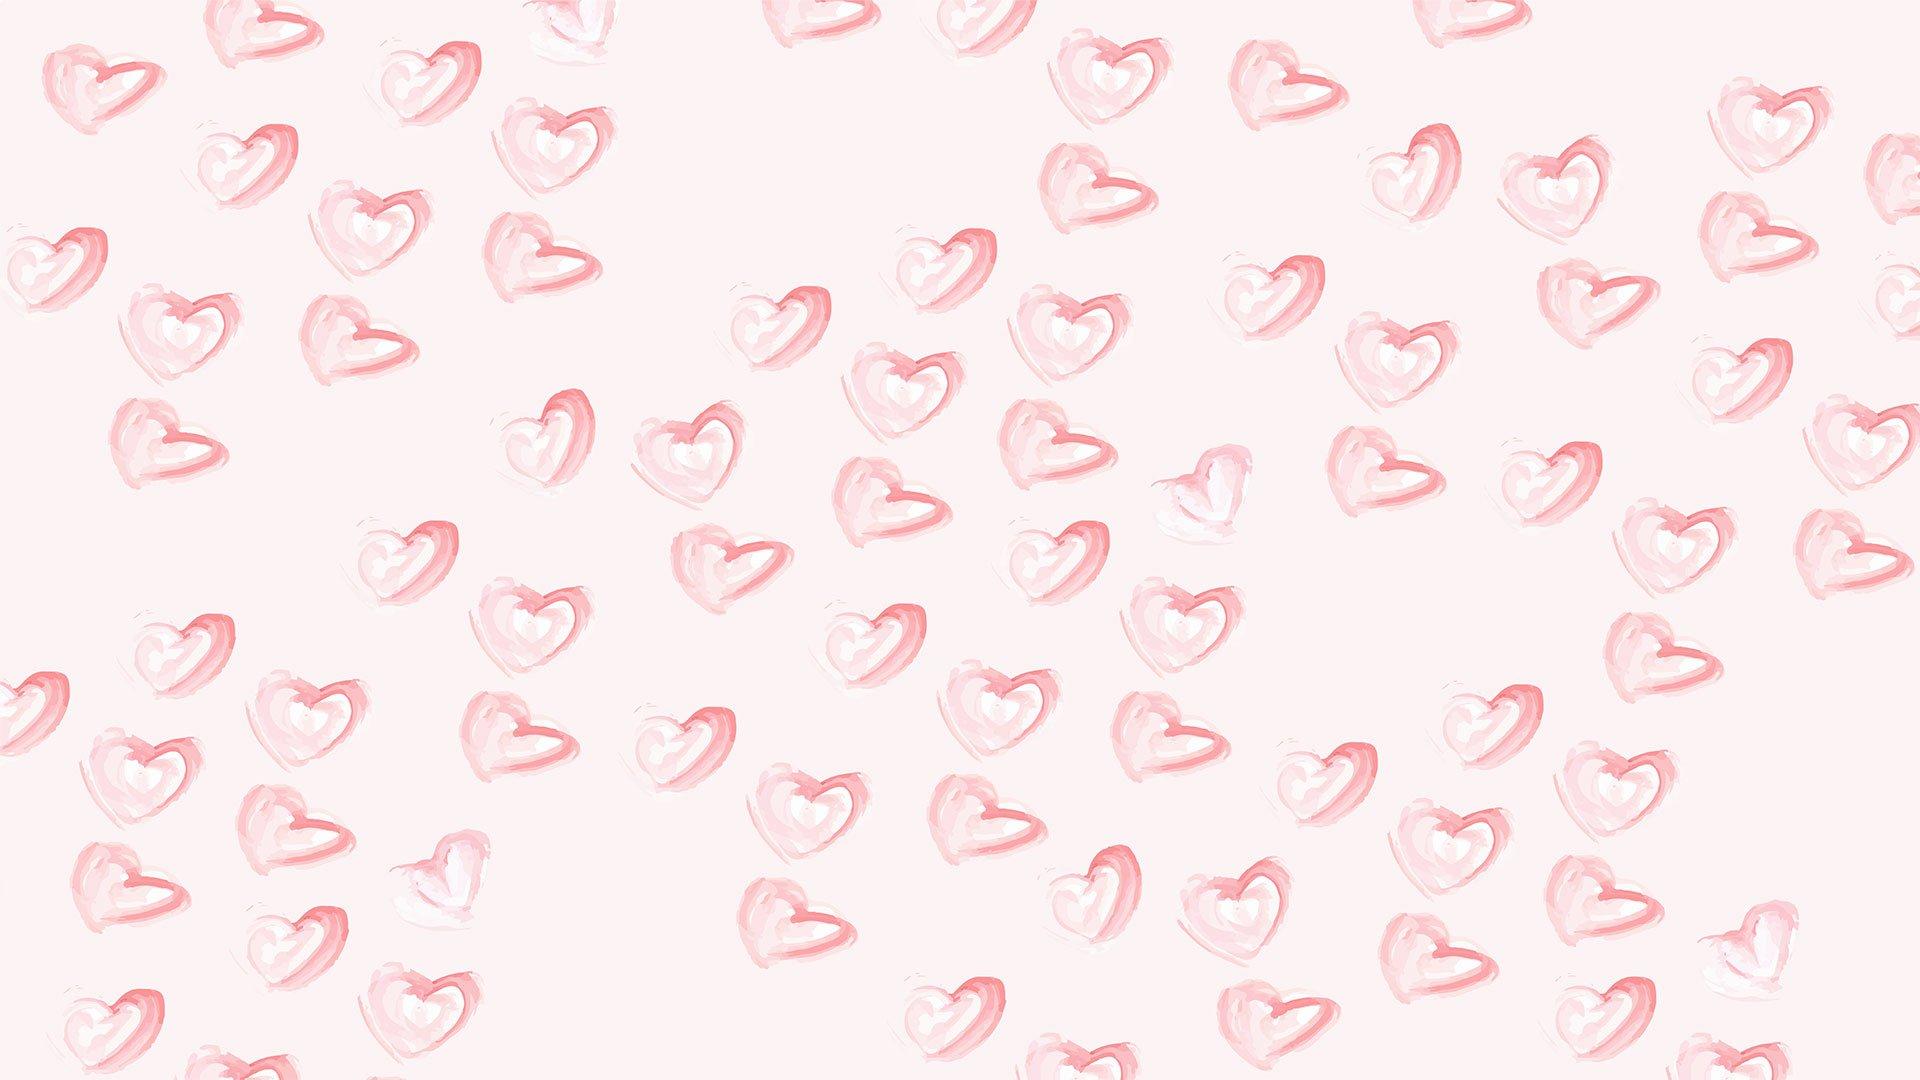 adorable heart desktop wallpaper by laurenconrad com